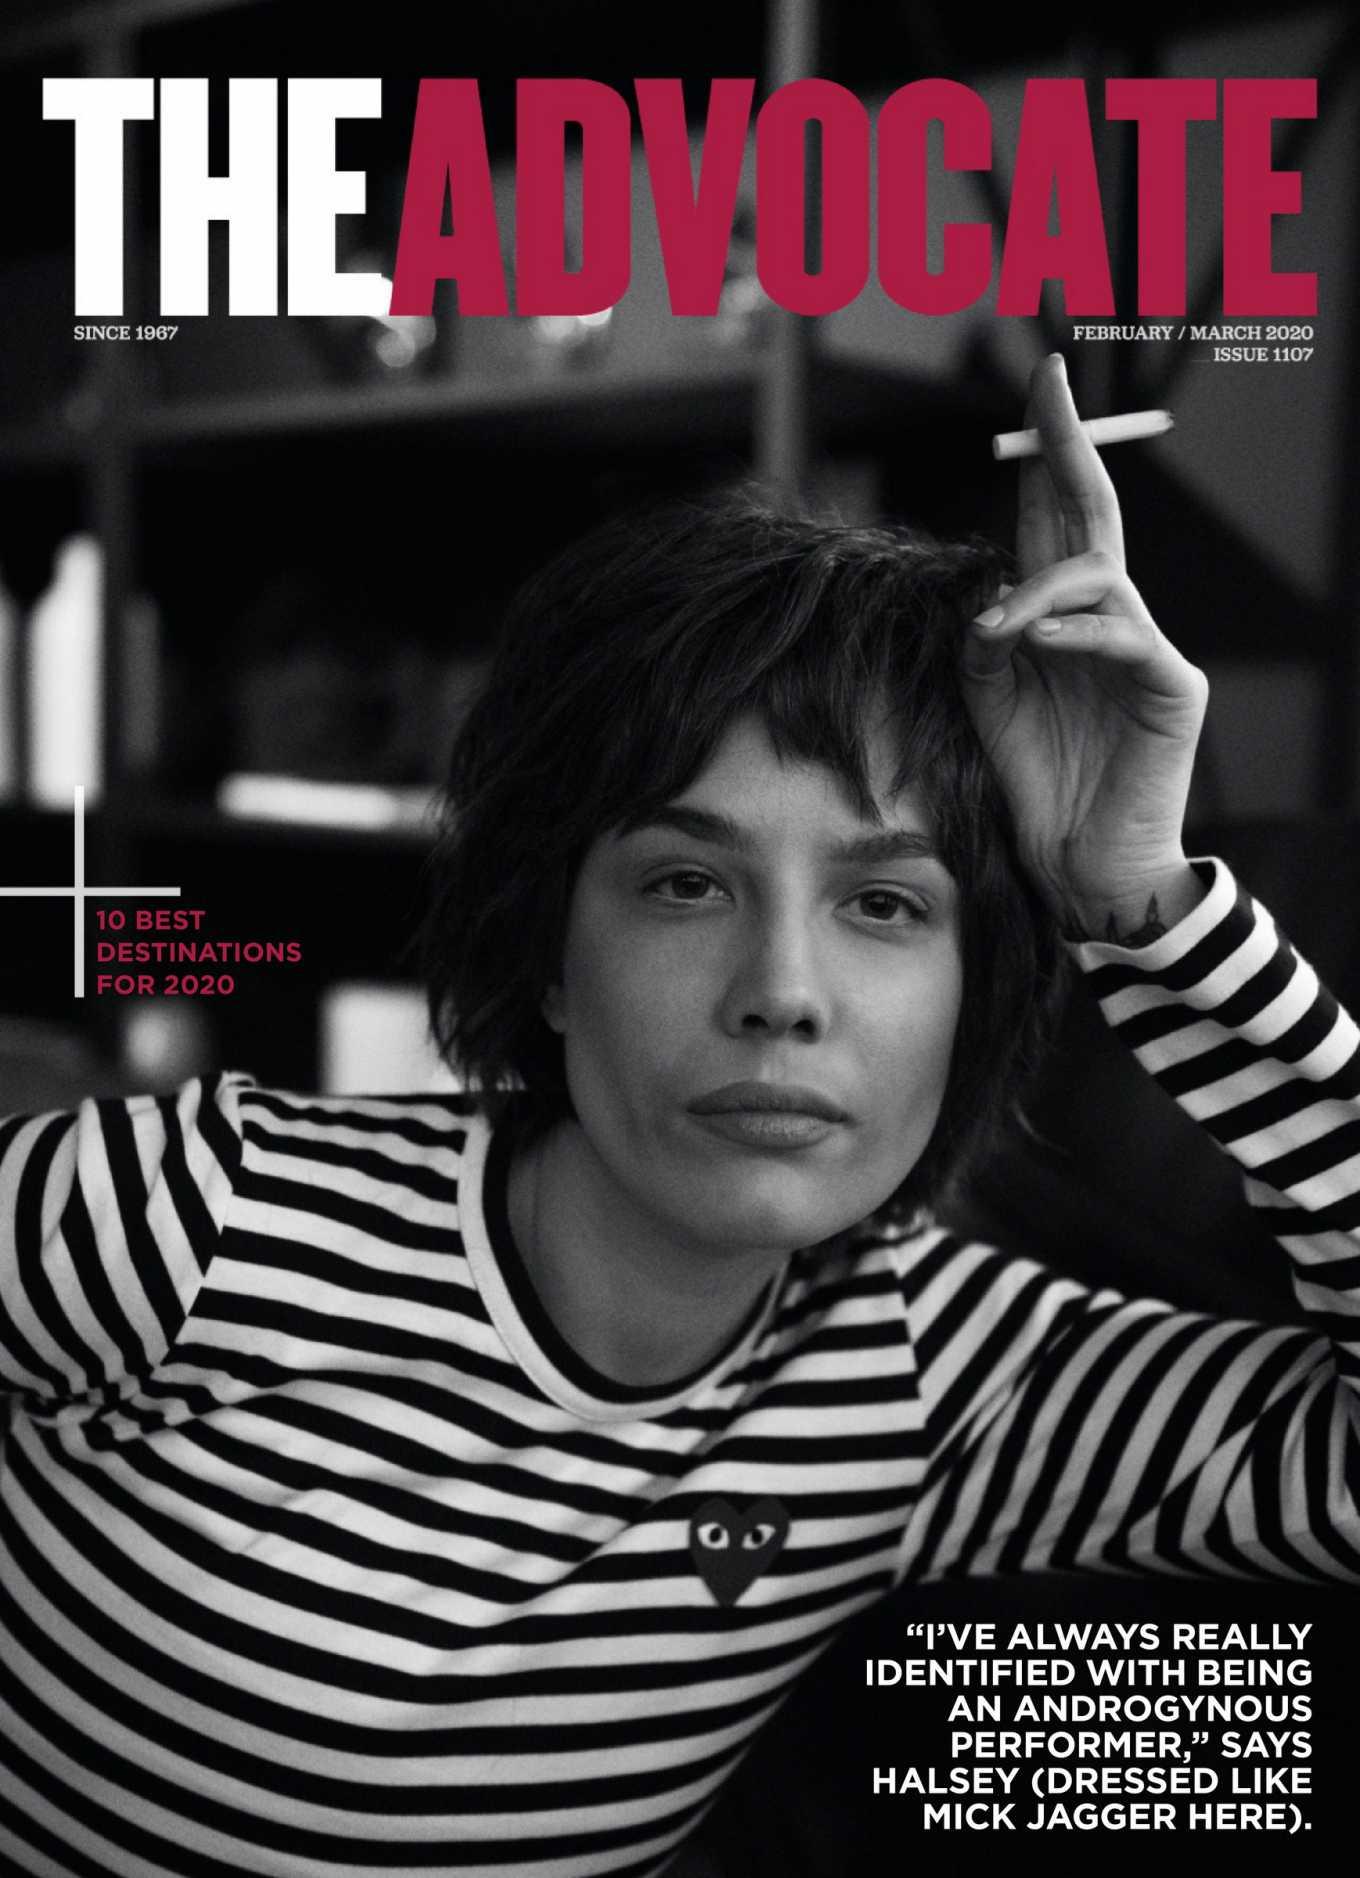 Halsey 2020 : Halsey – The Advocate Magazine (February – March 2020)-07